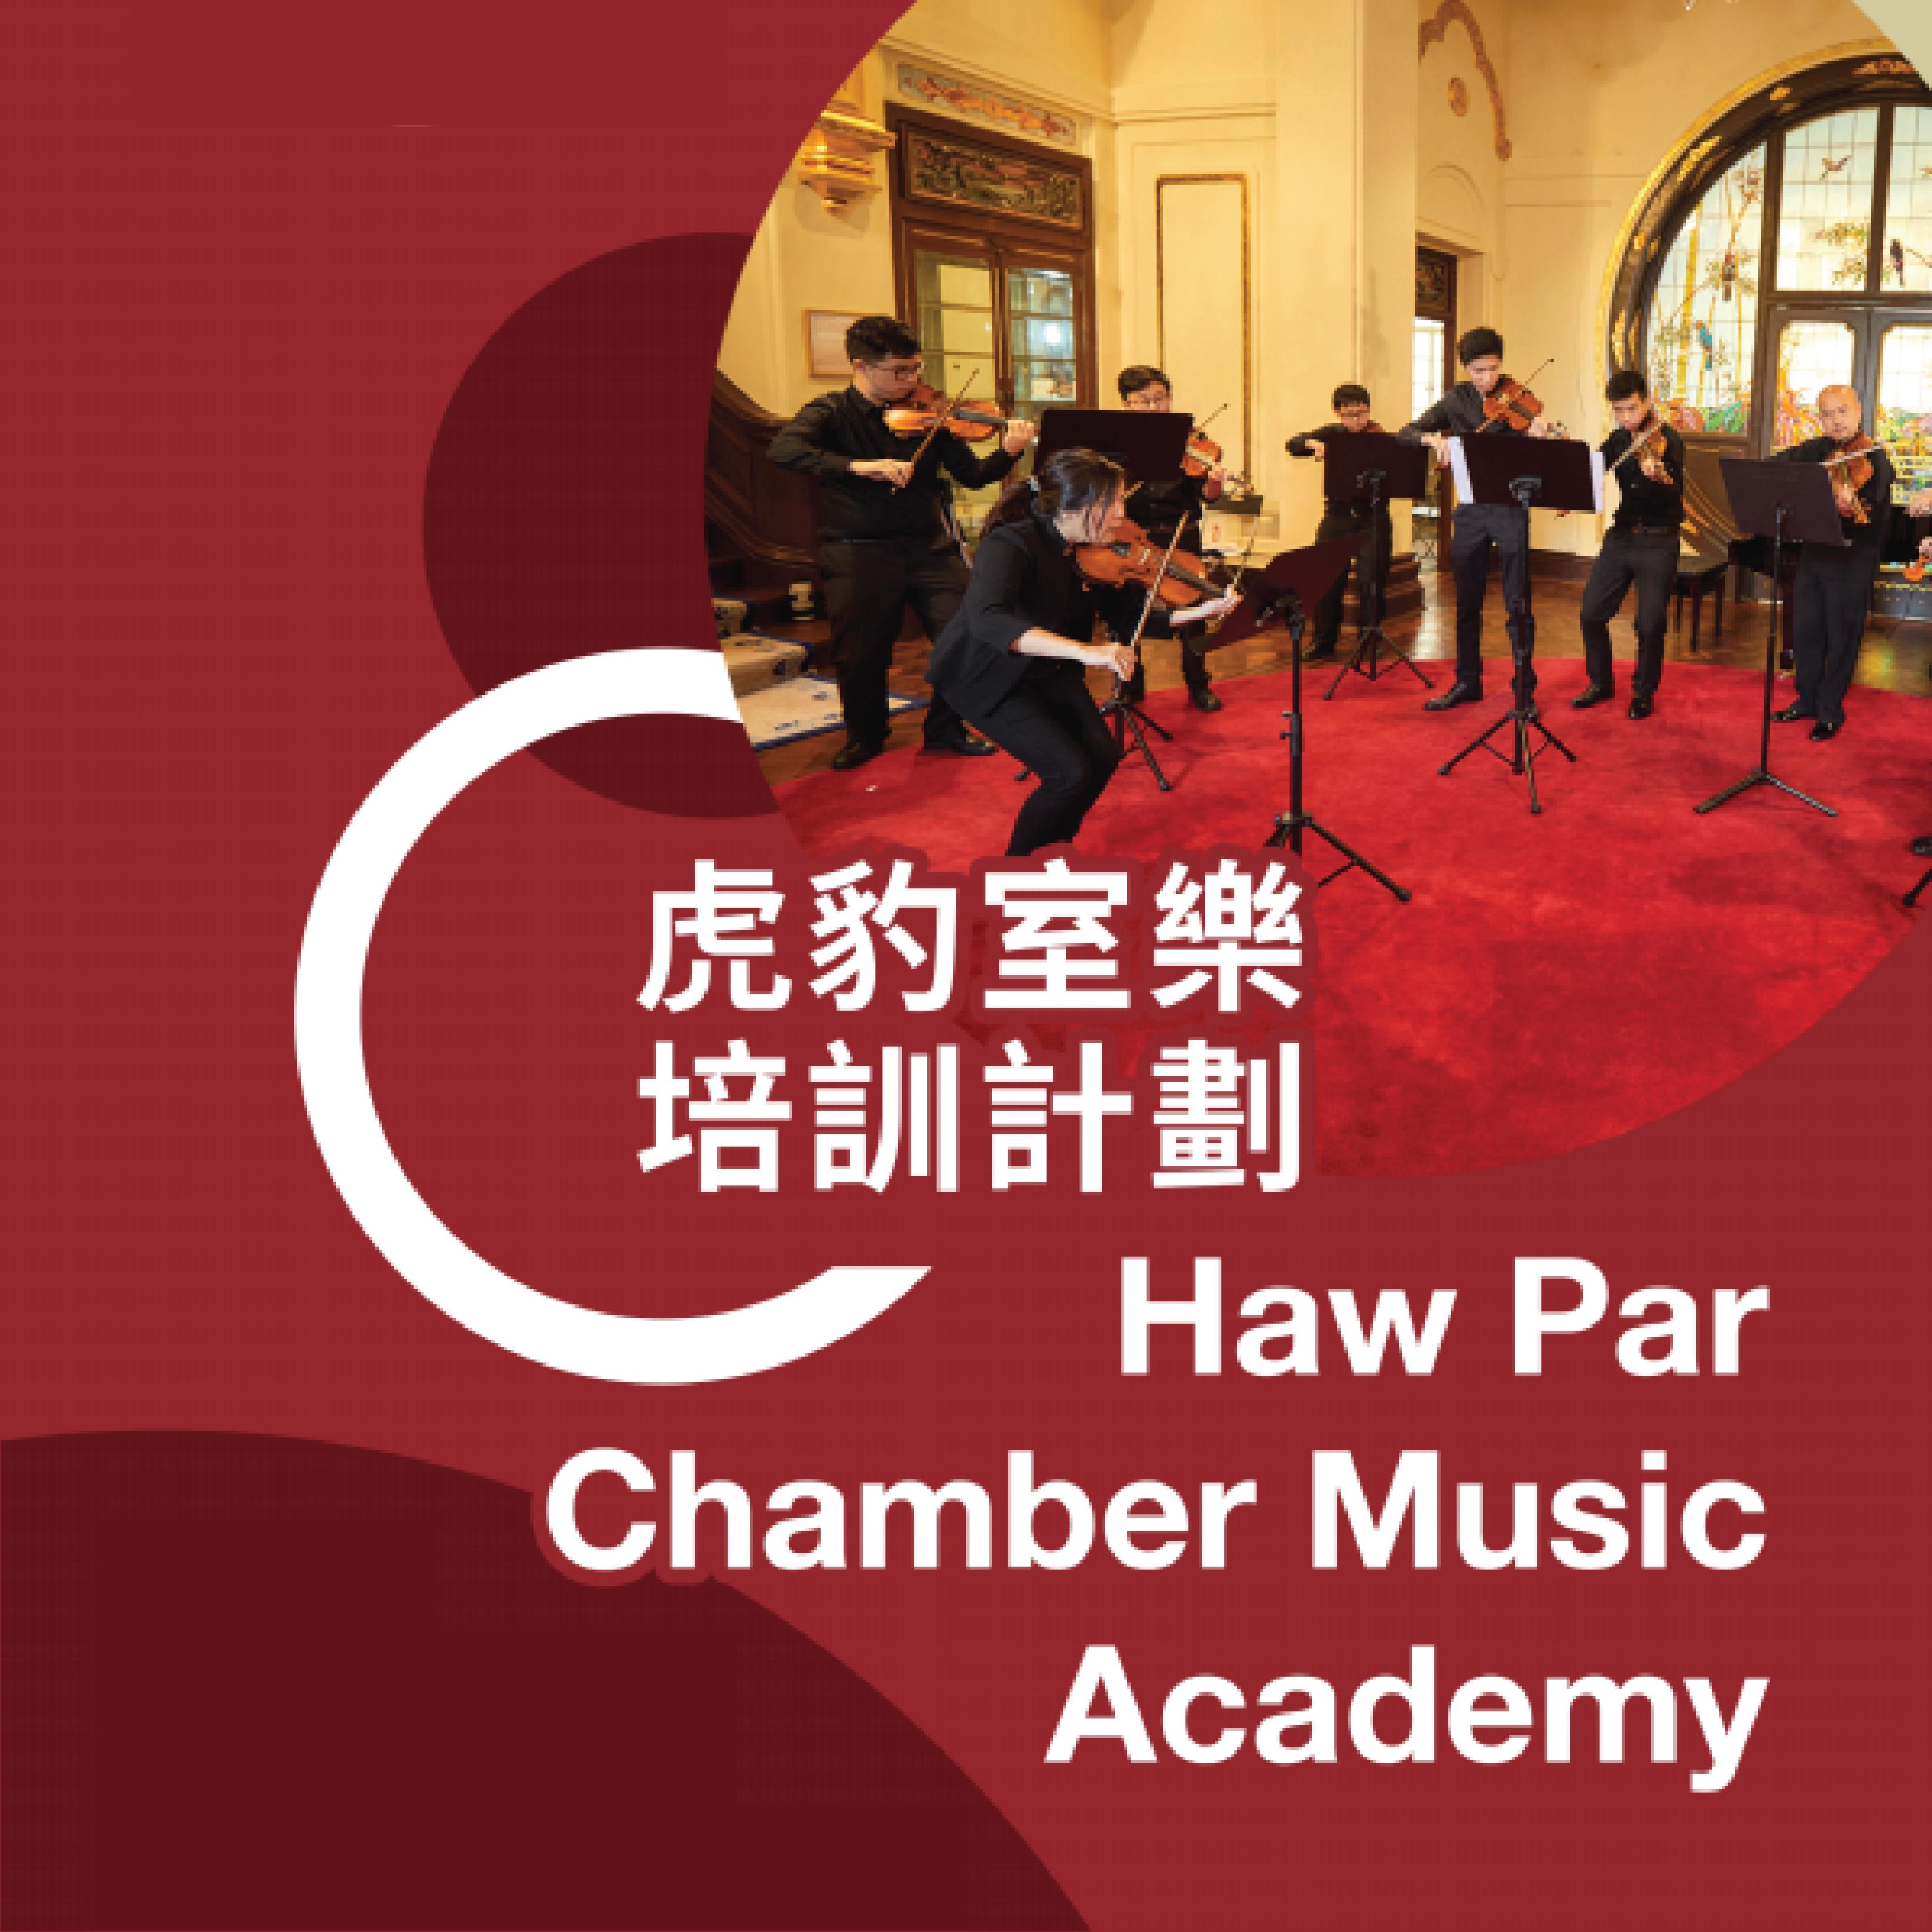 Chamber Music Academy